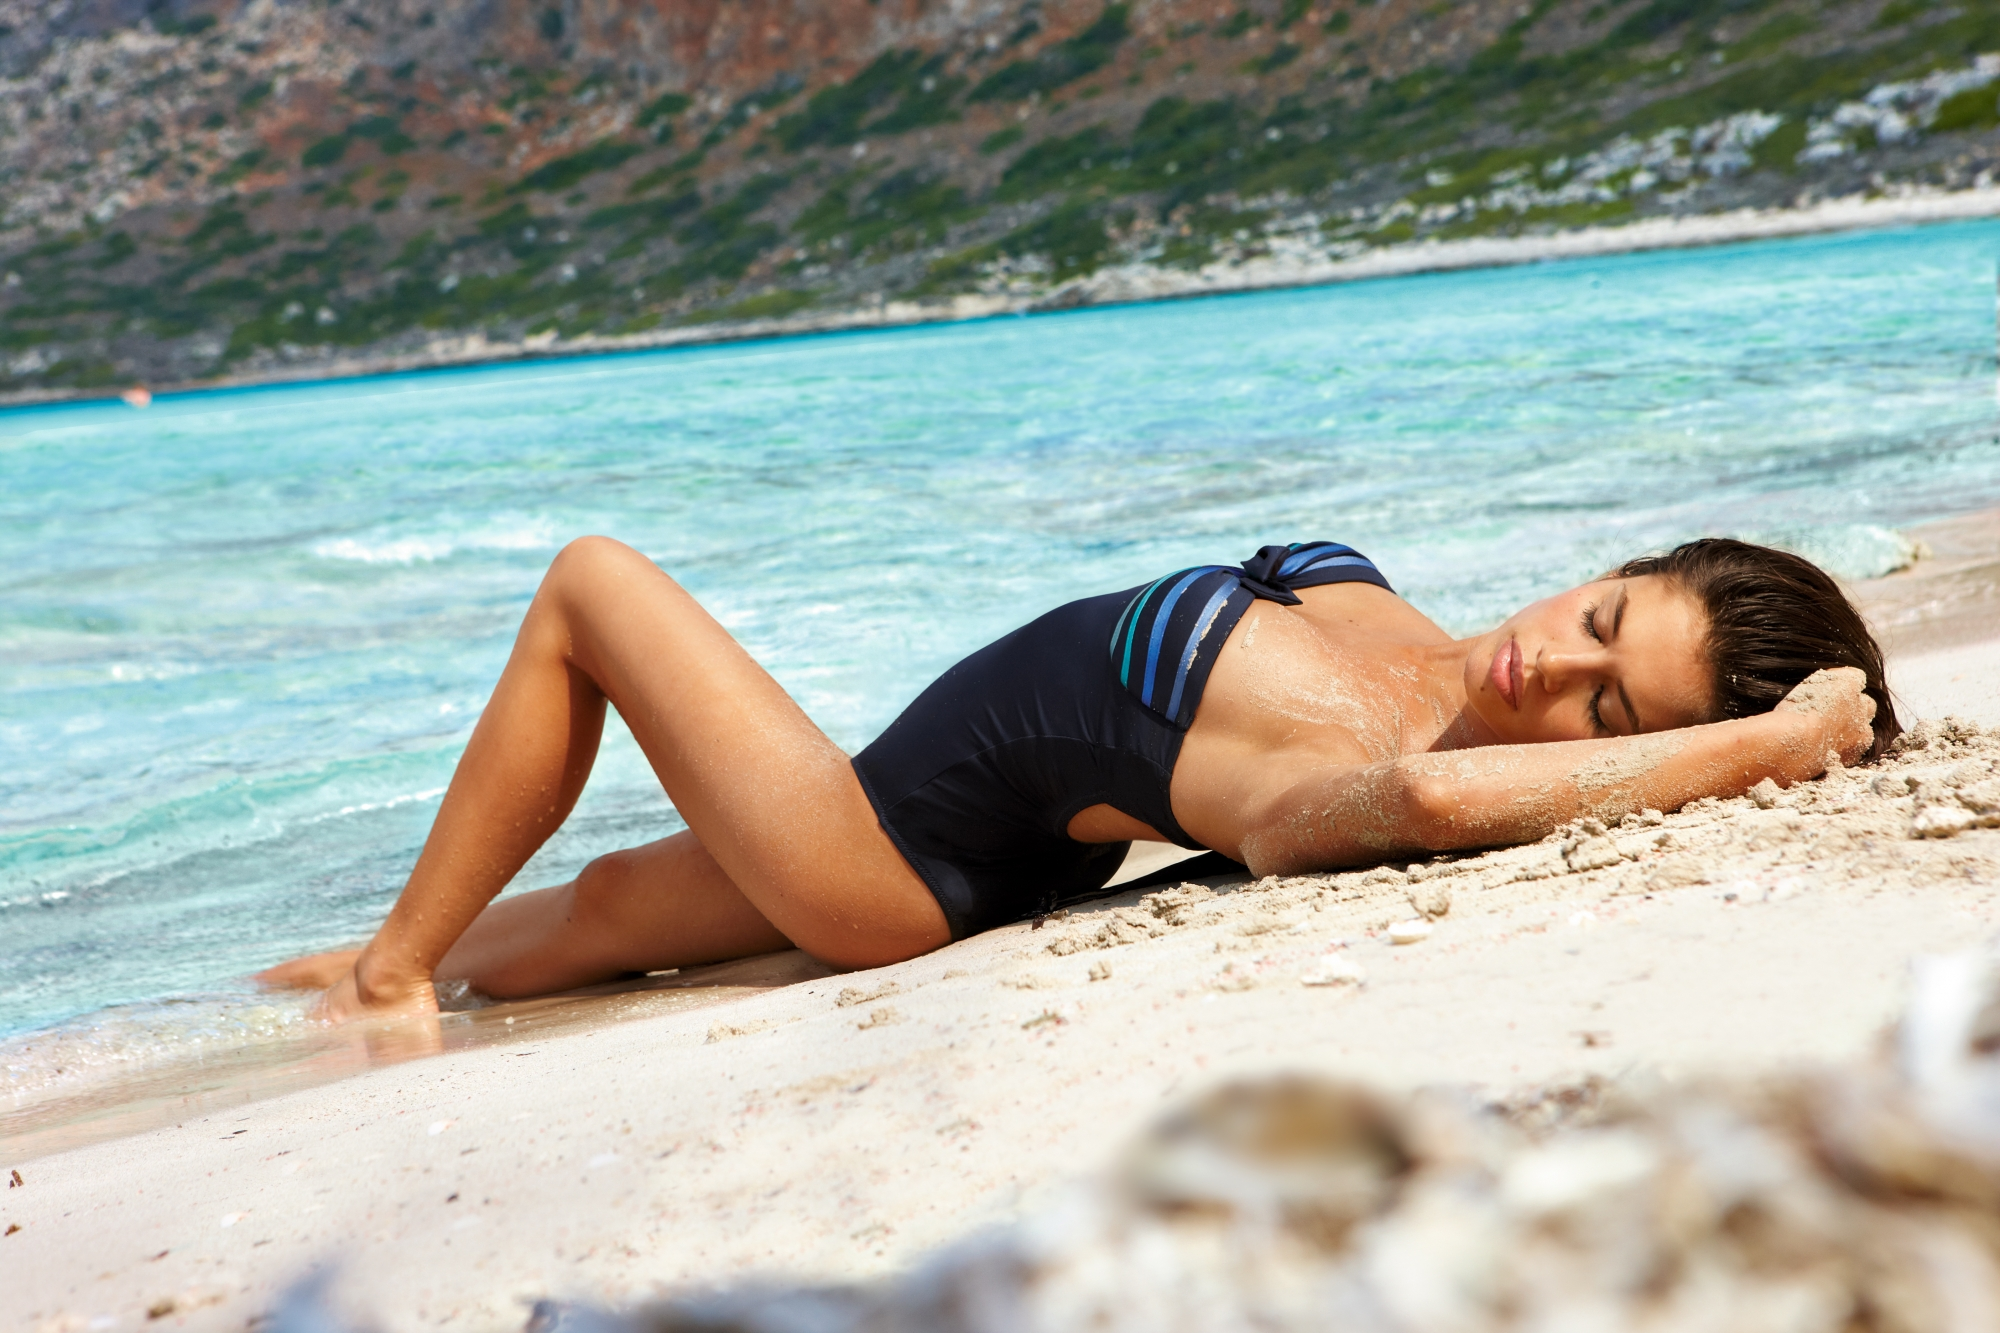 beach-bikini-pool-sara